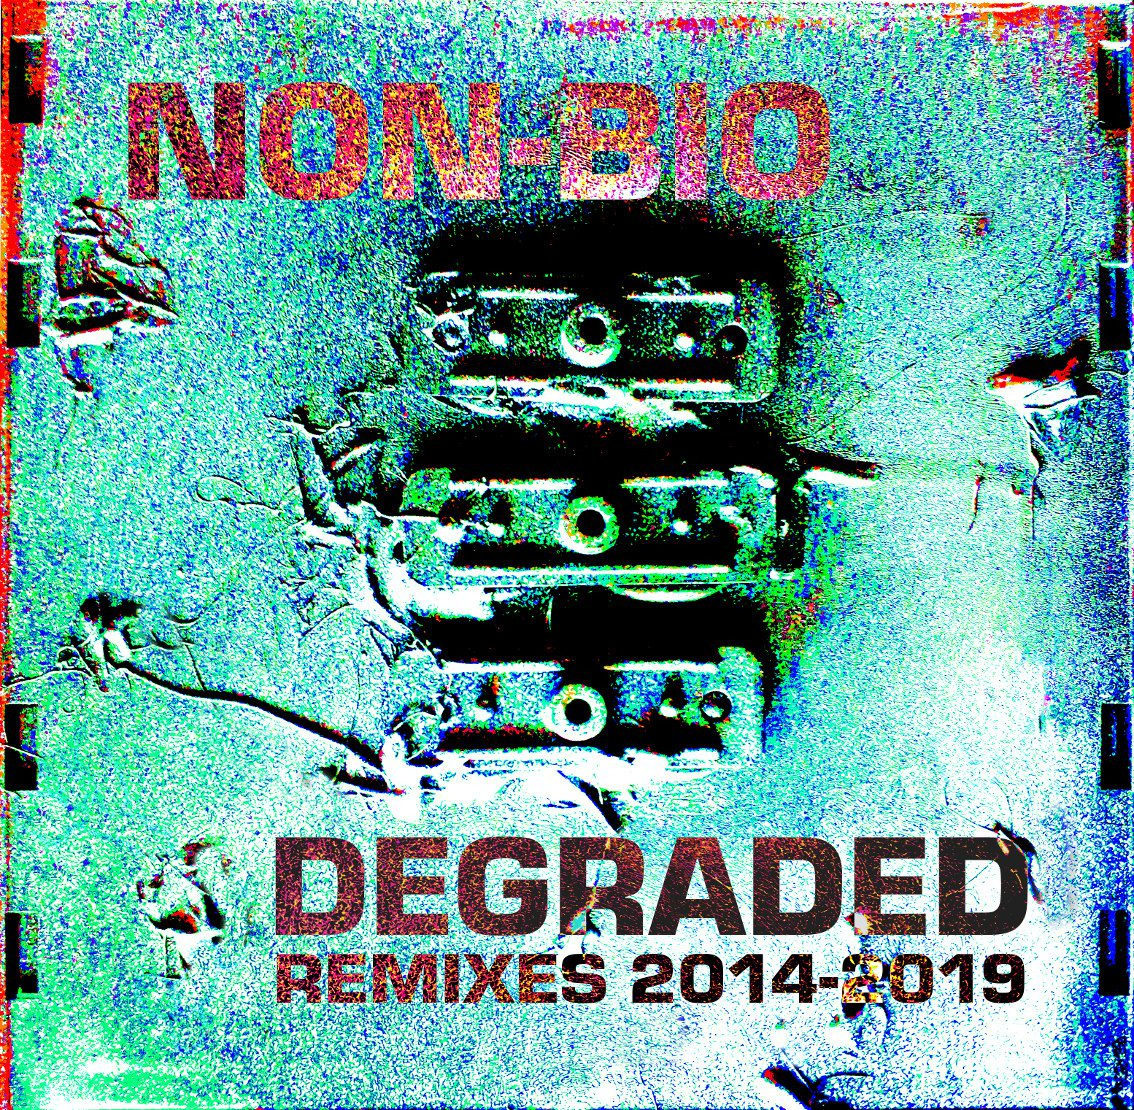 Non-Bio releases remix album 'Degraded - Remixes 2014-2019'